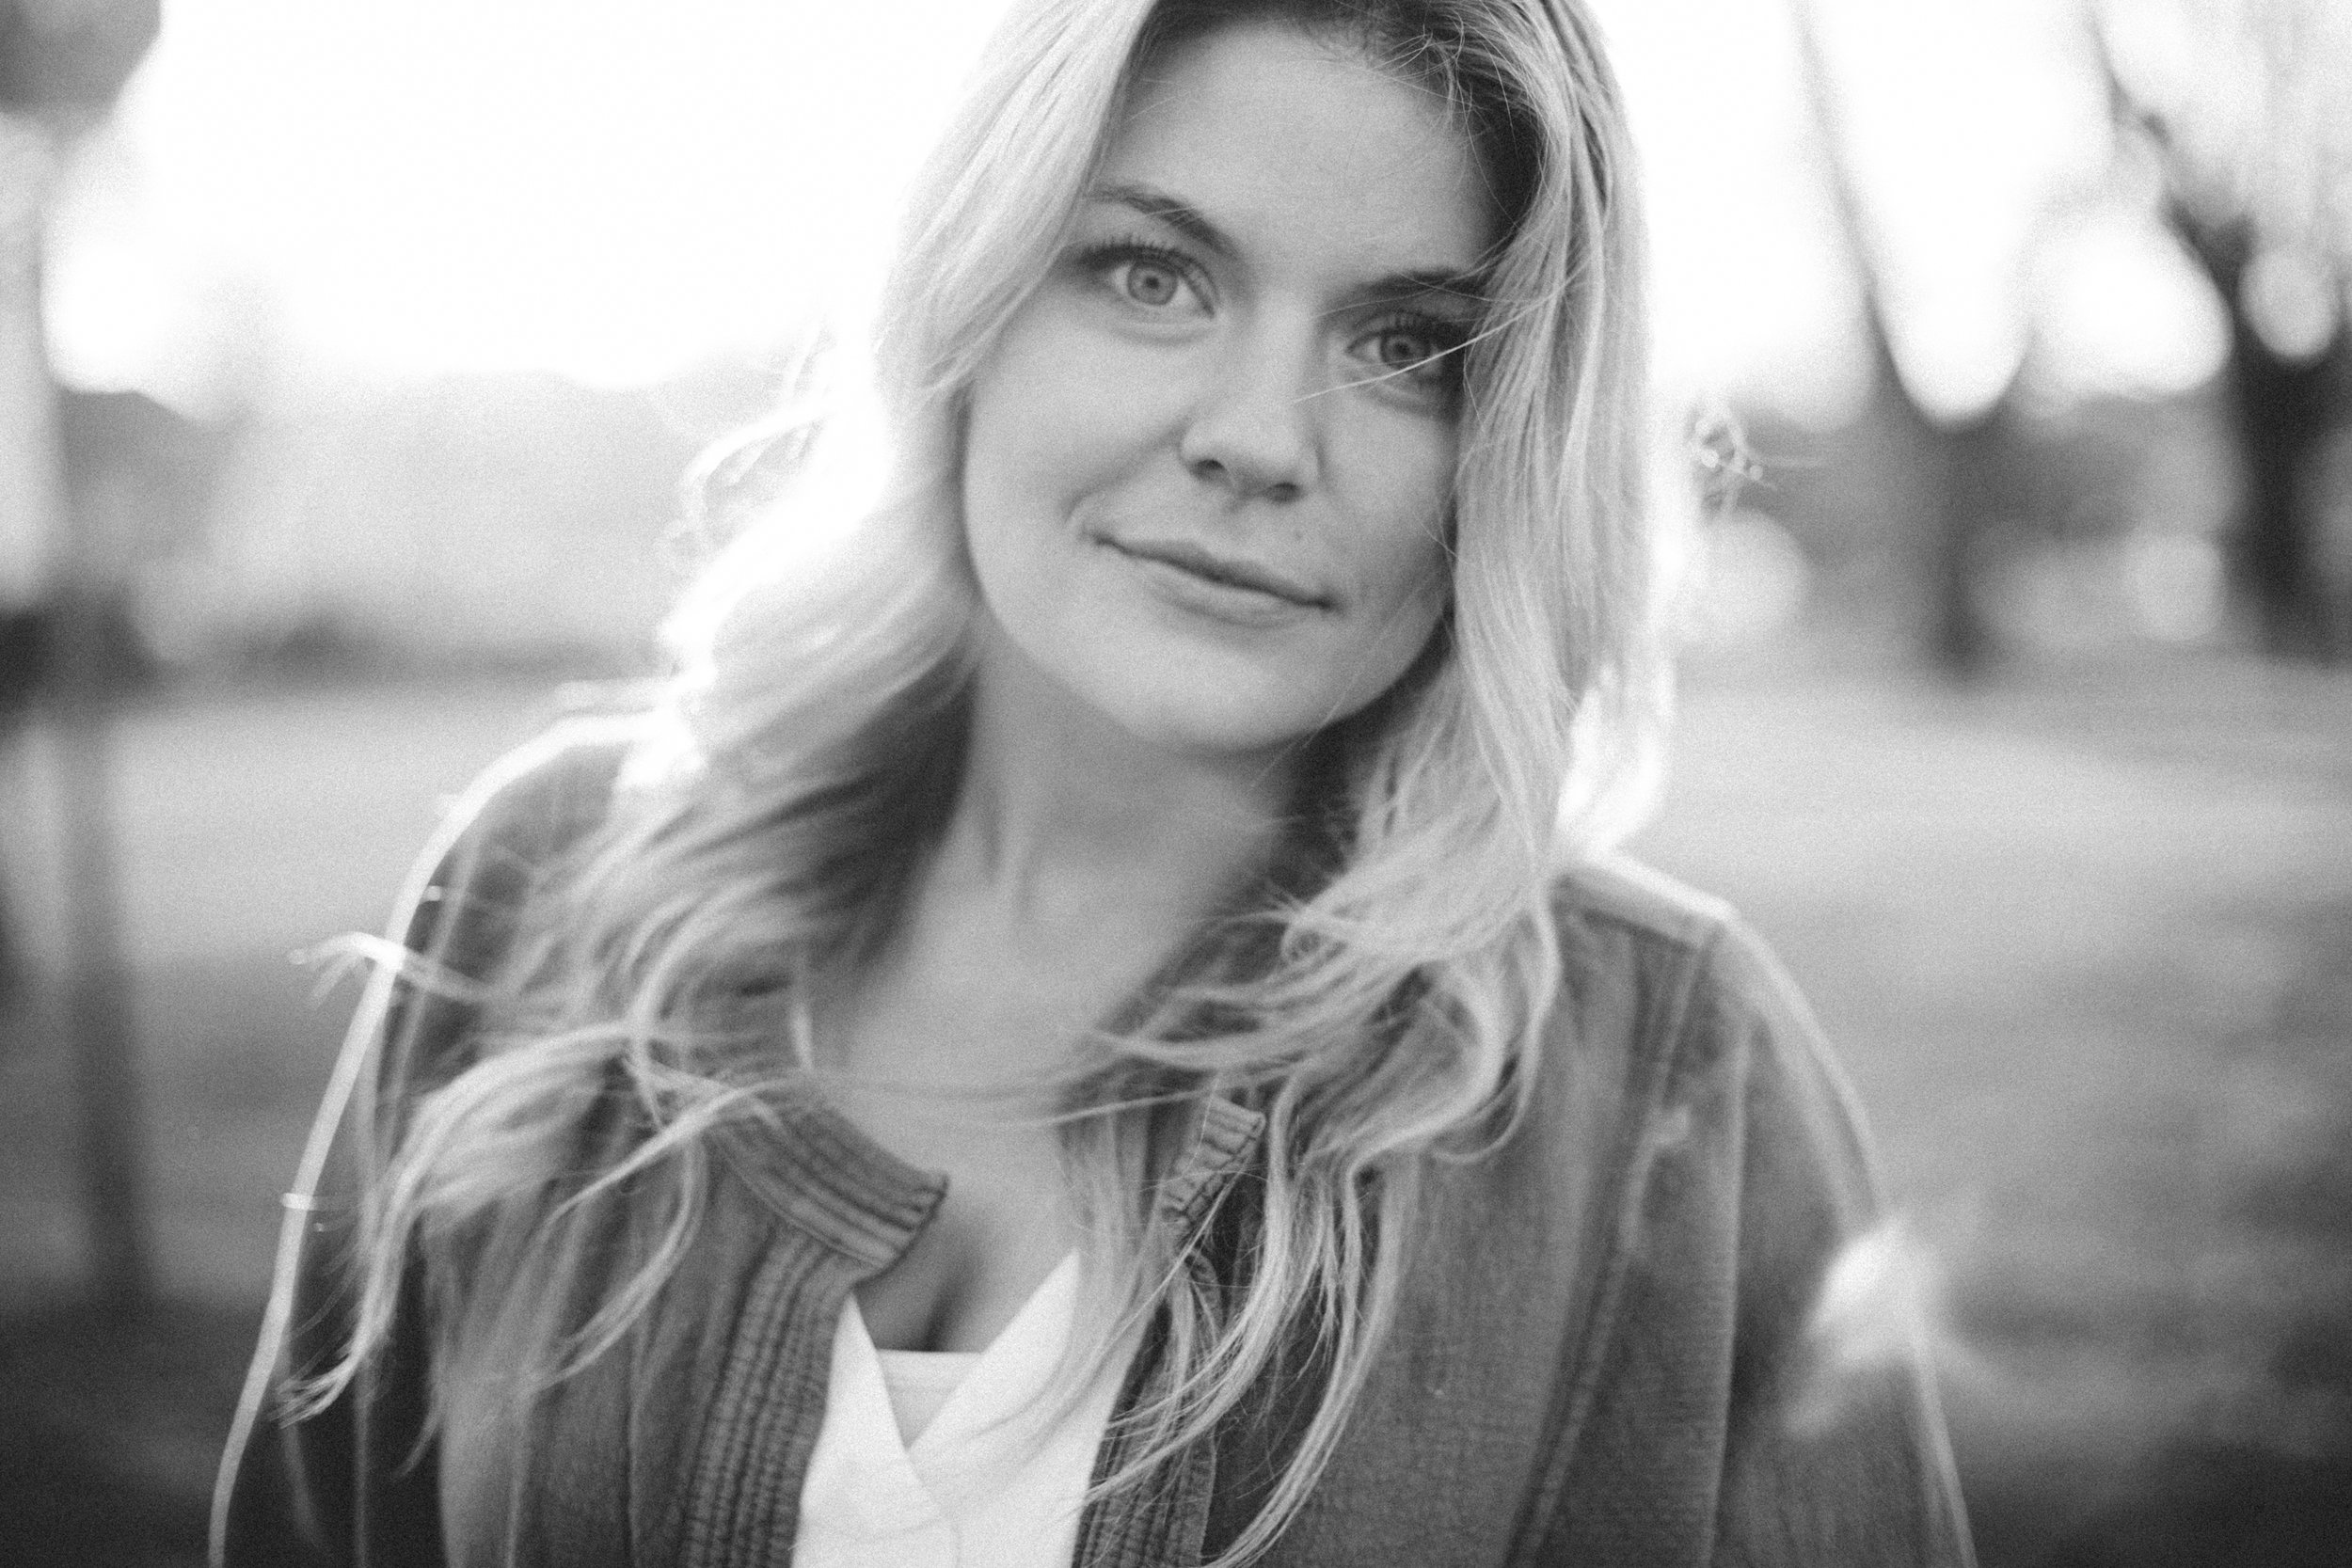 Mikaela Hamilton